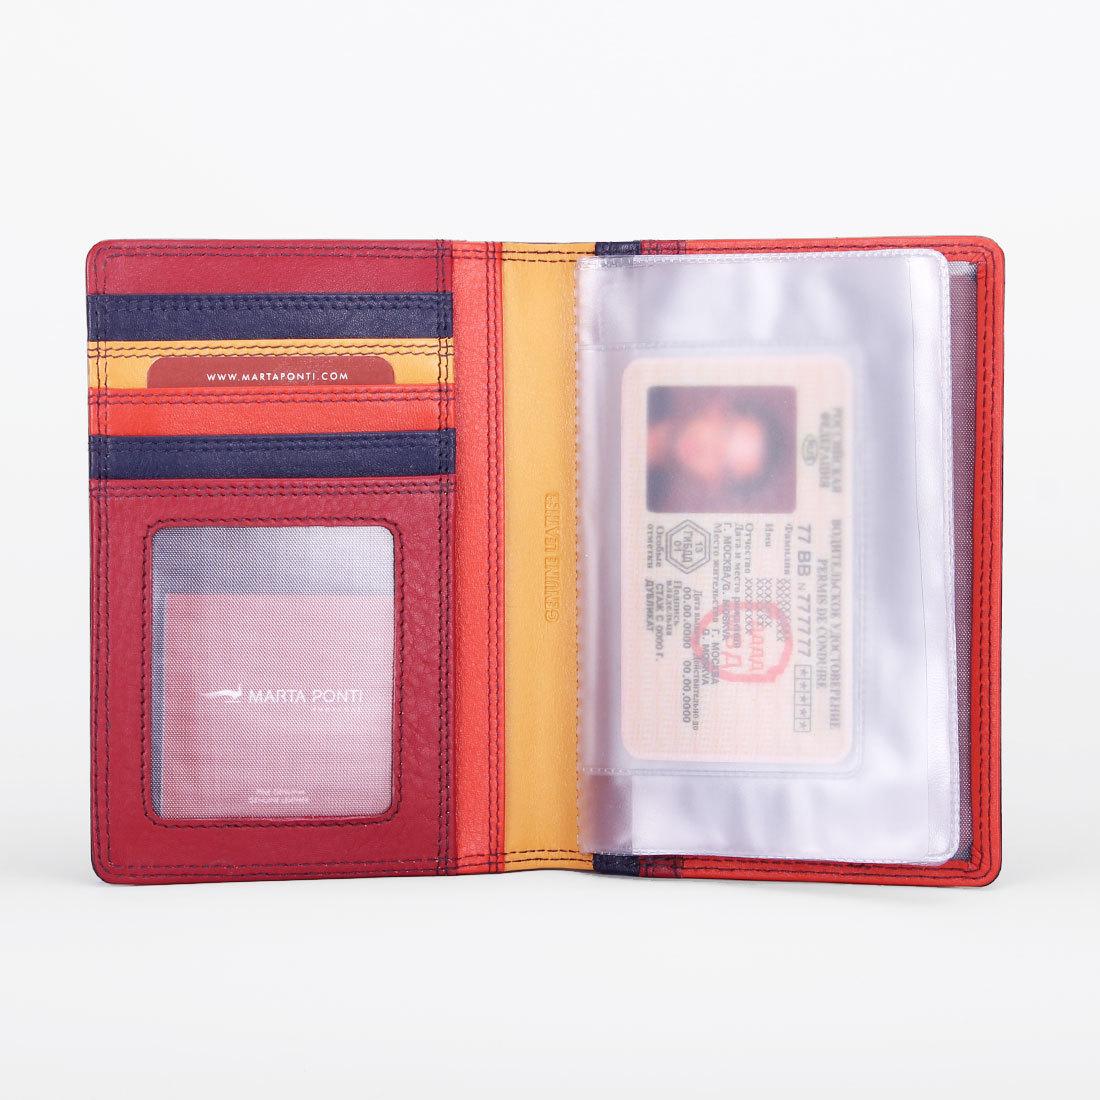 B270047 Murano - Обложка для документов Marta Ponti